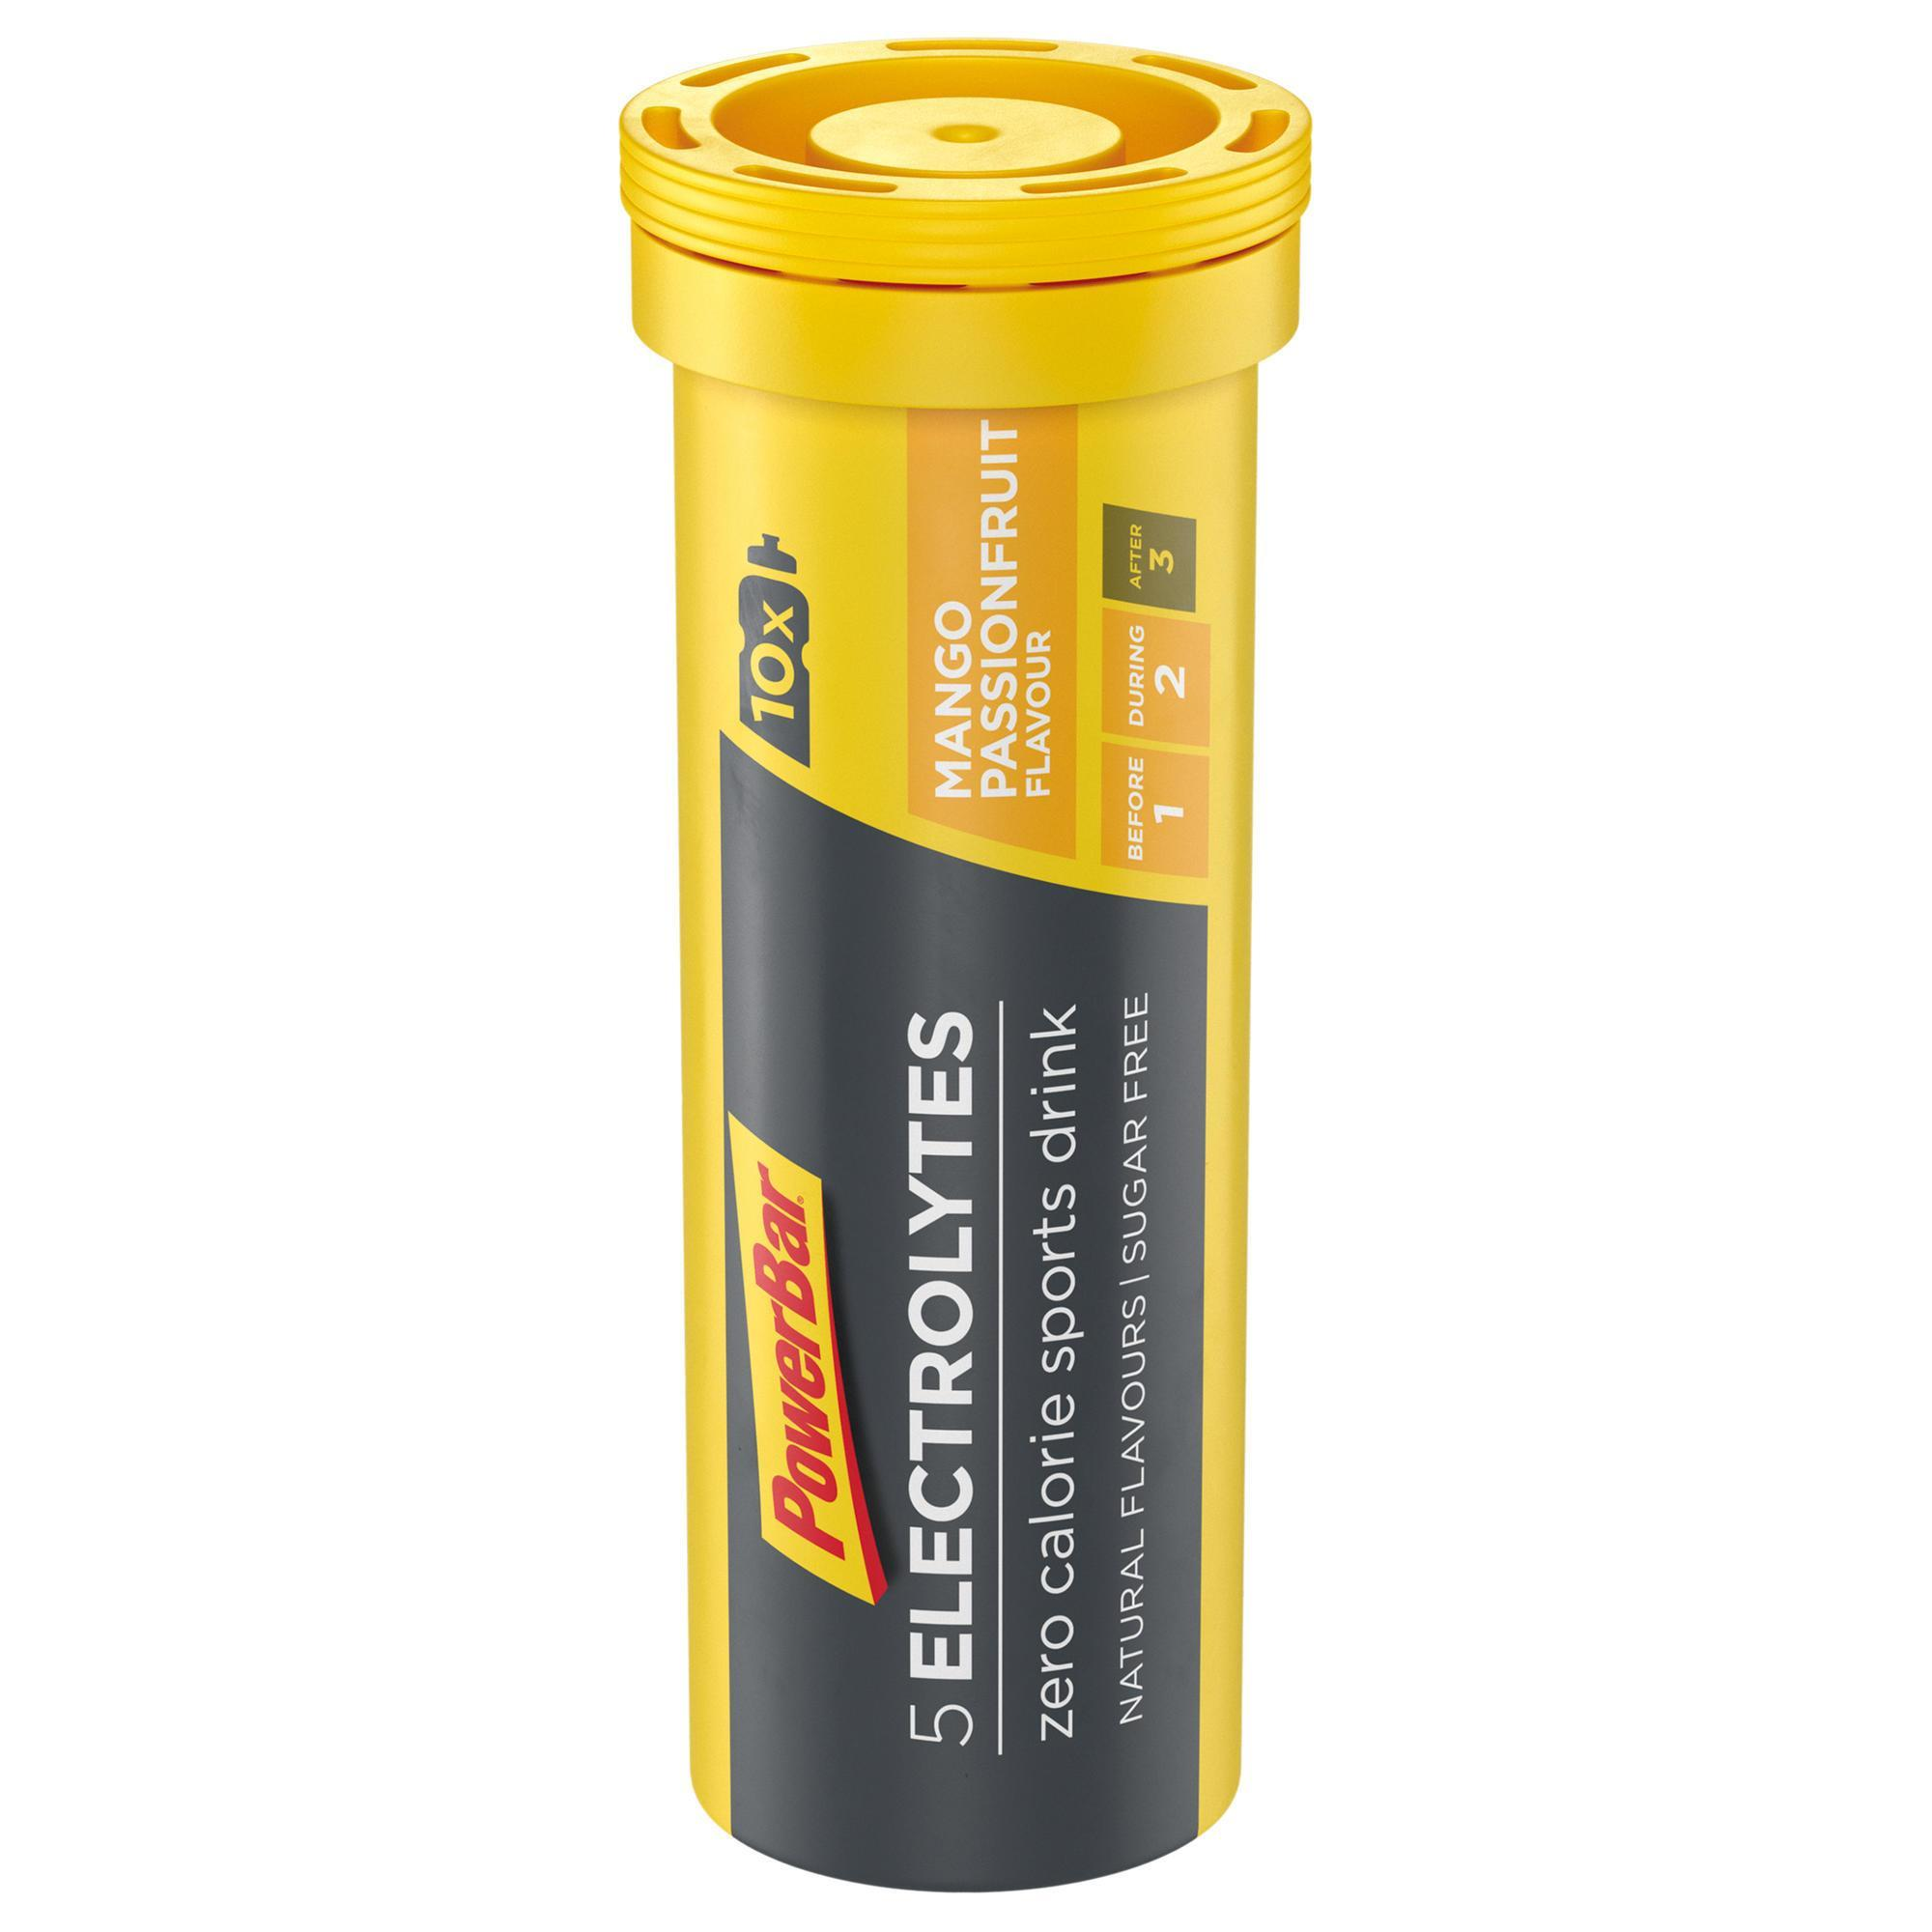 Powerbar Sportdrank tabletten Electrolytes mango 10x 4,2 g kopen